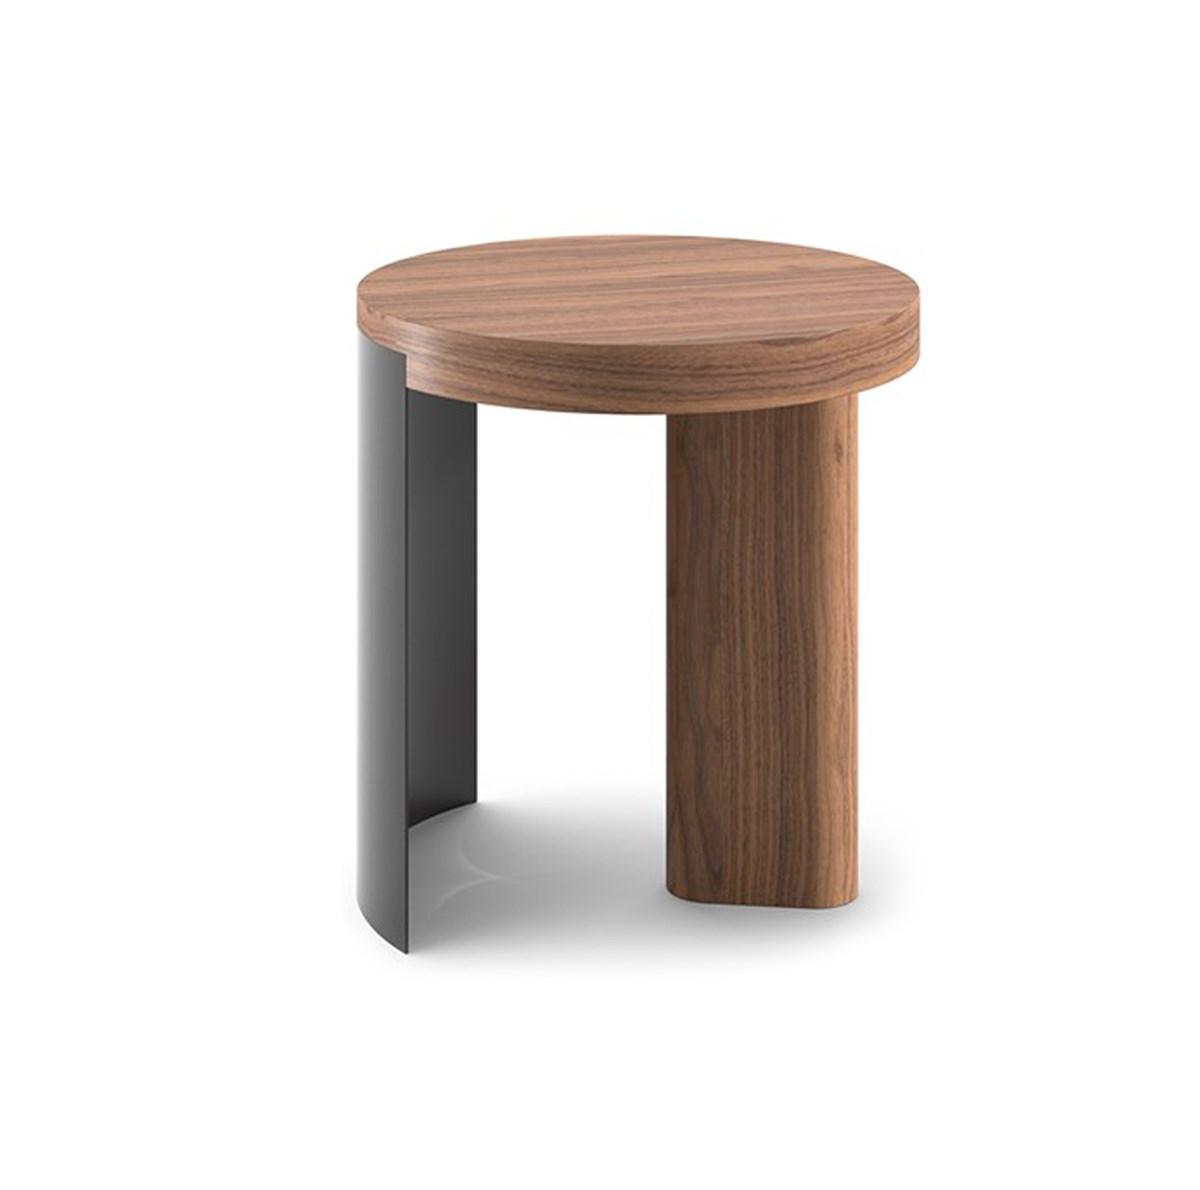 Cassina-Patricia-Urquiola-Bio-Mbo-Bedside-Table-Matisse-1